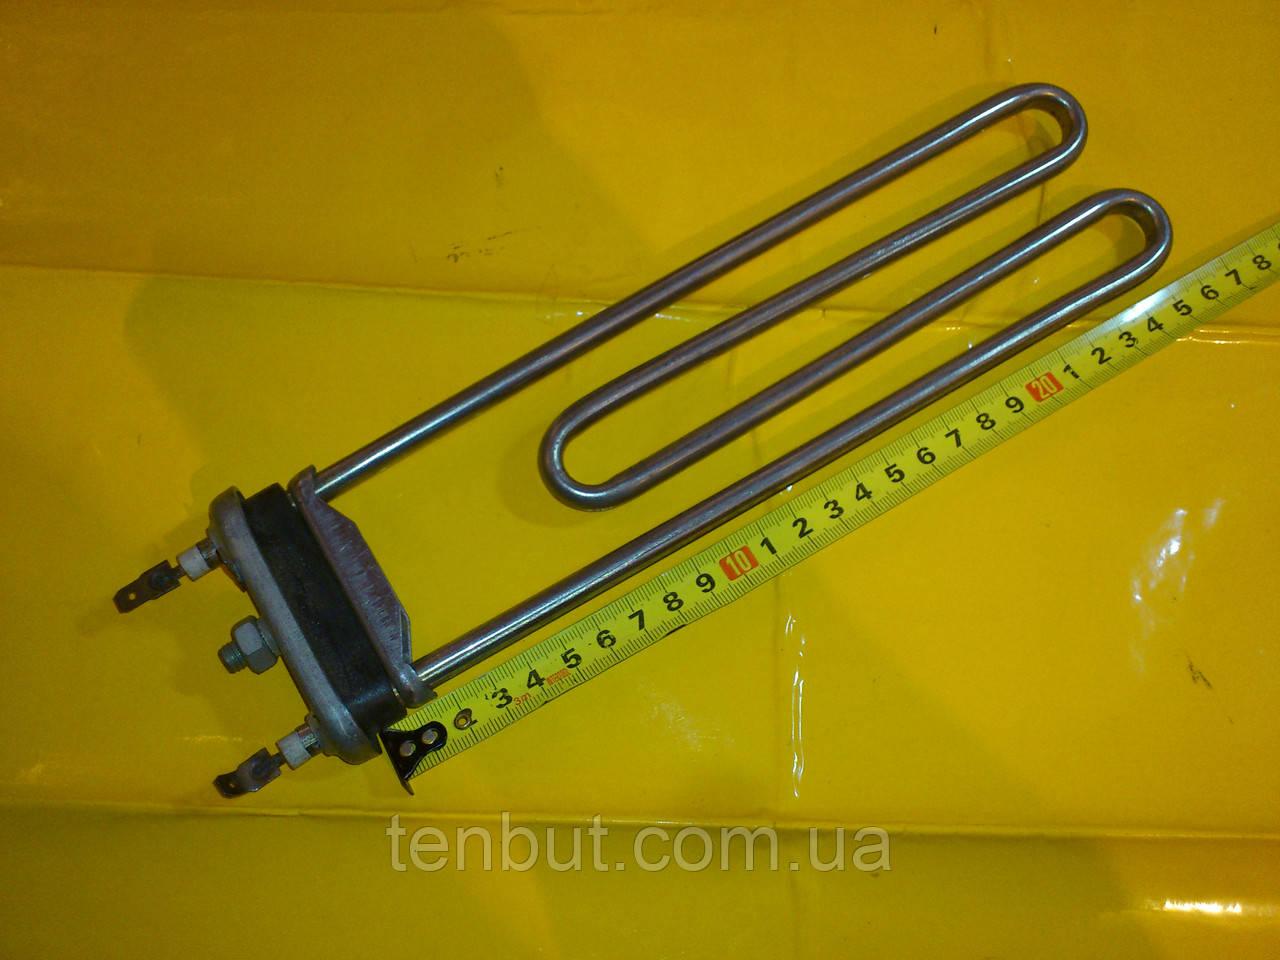 Тэн на стиральную машинку 3000 Вт. / 265 мм. производство Украина